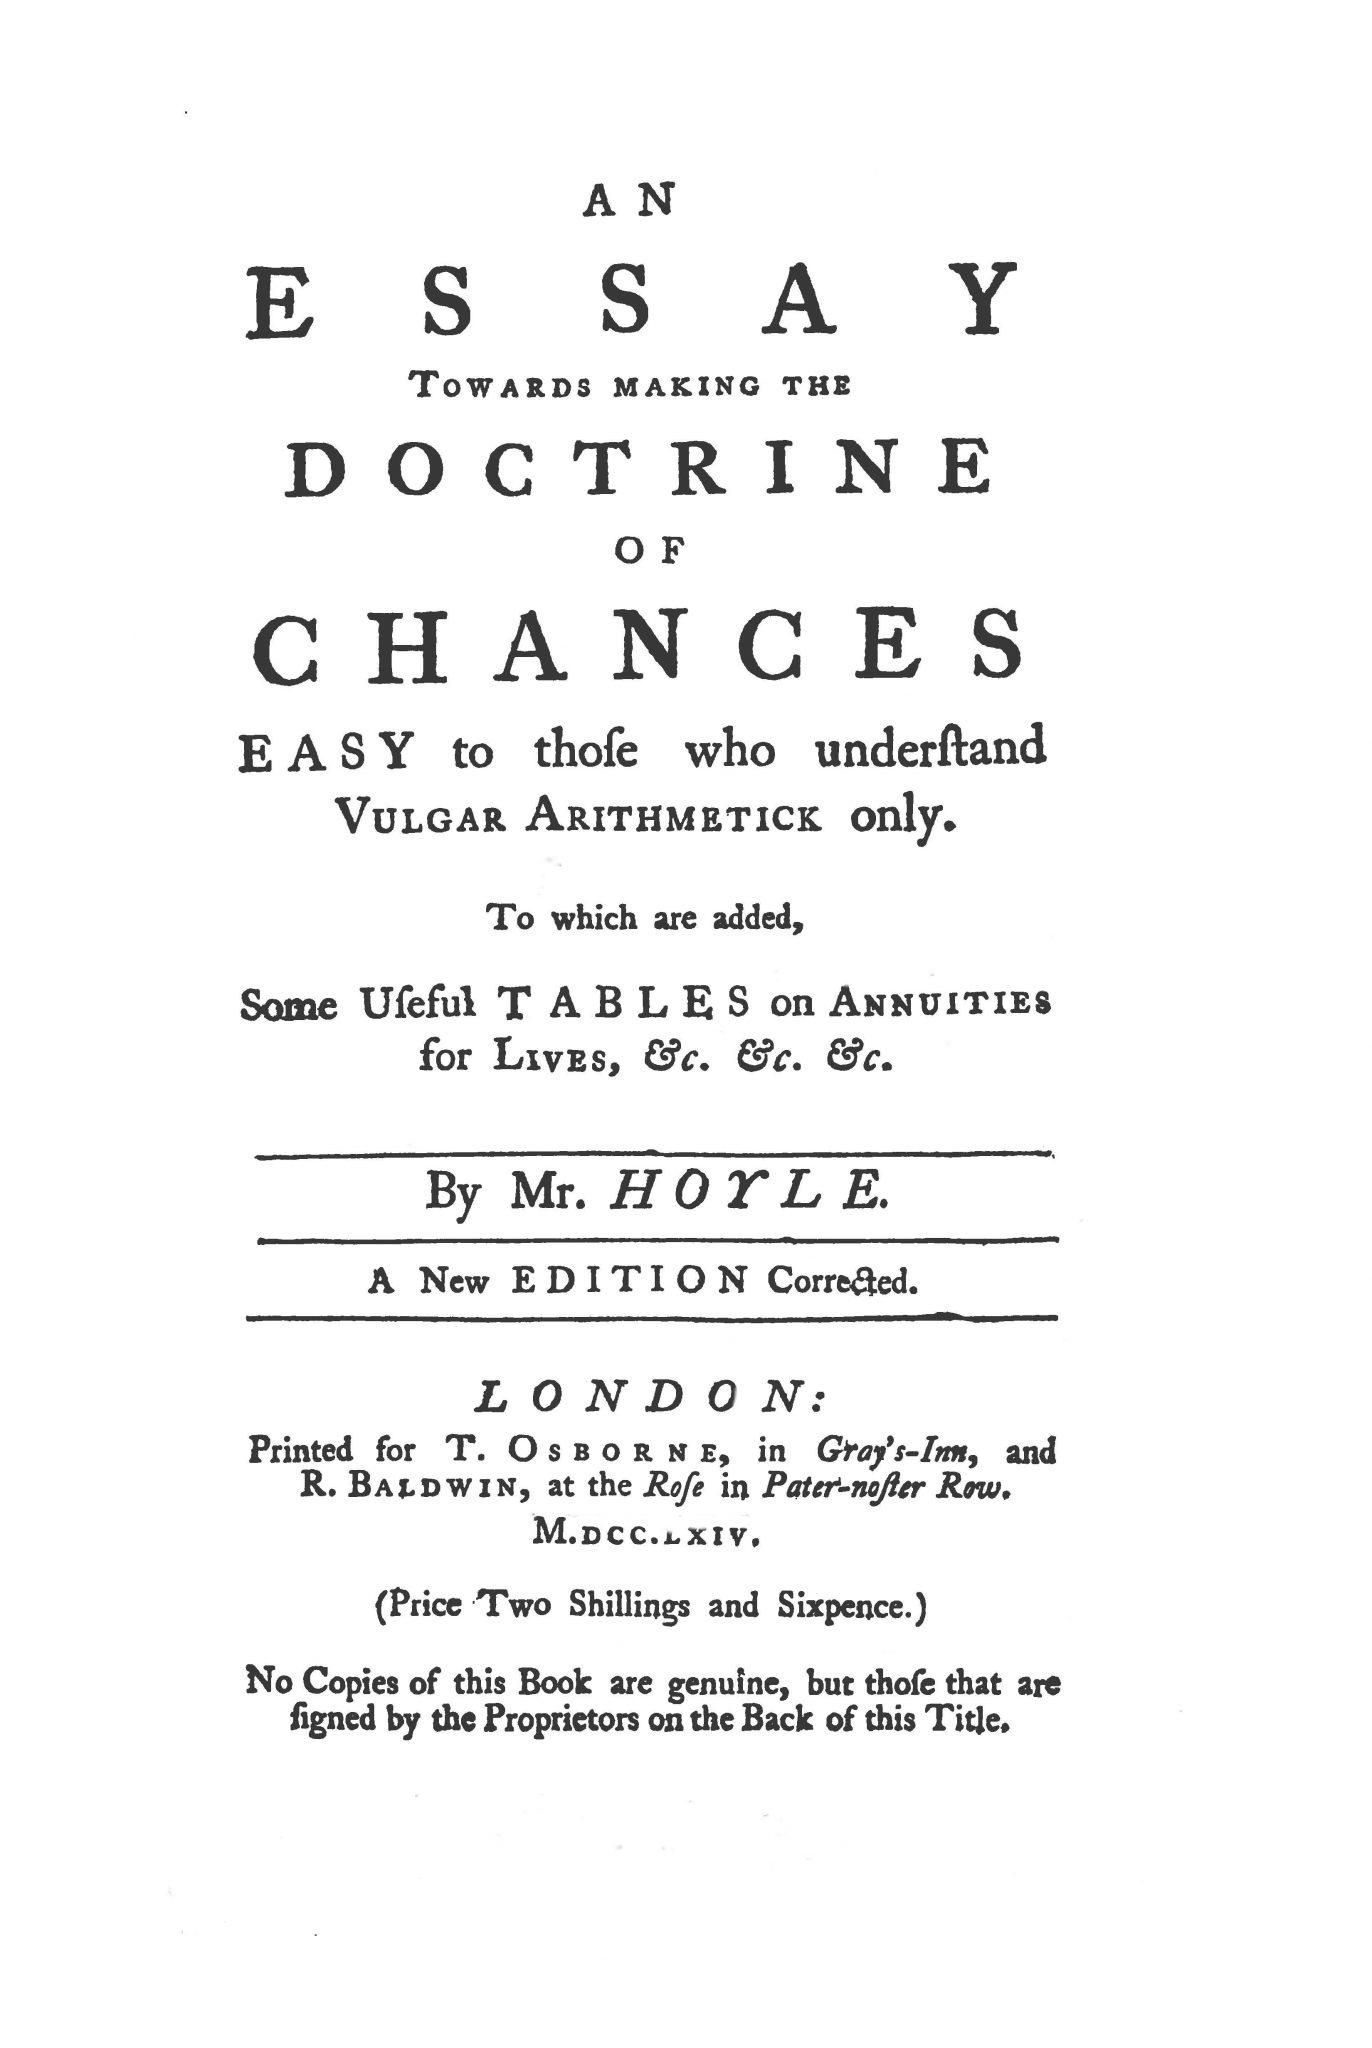 Hoyle's Essay on the Doctrine of Chances